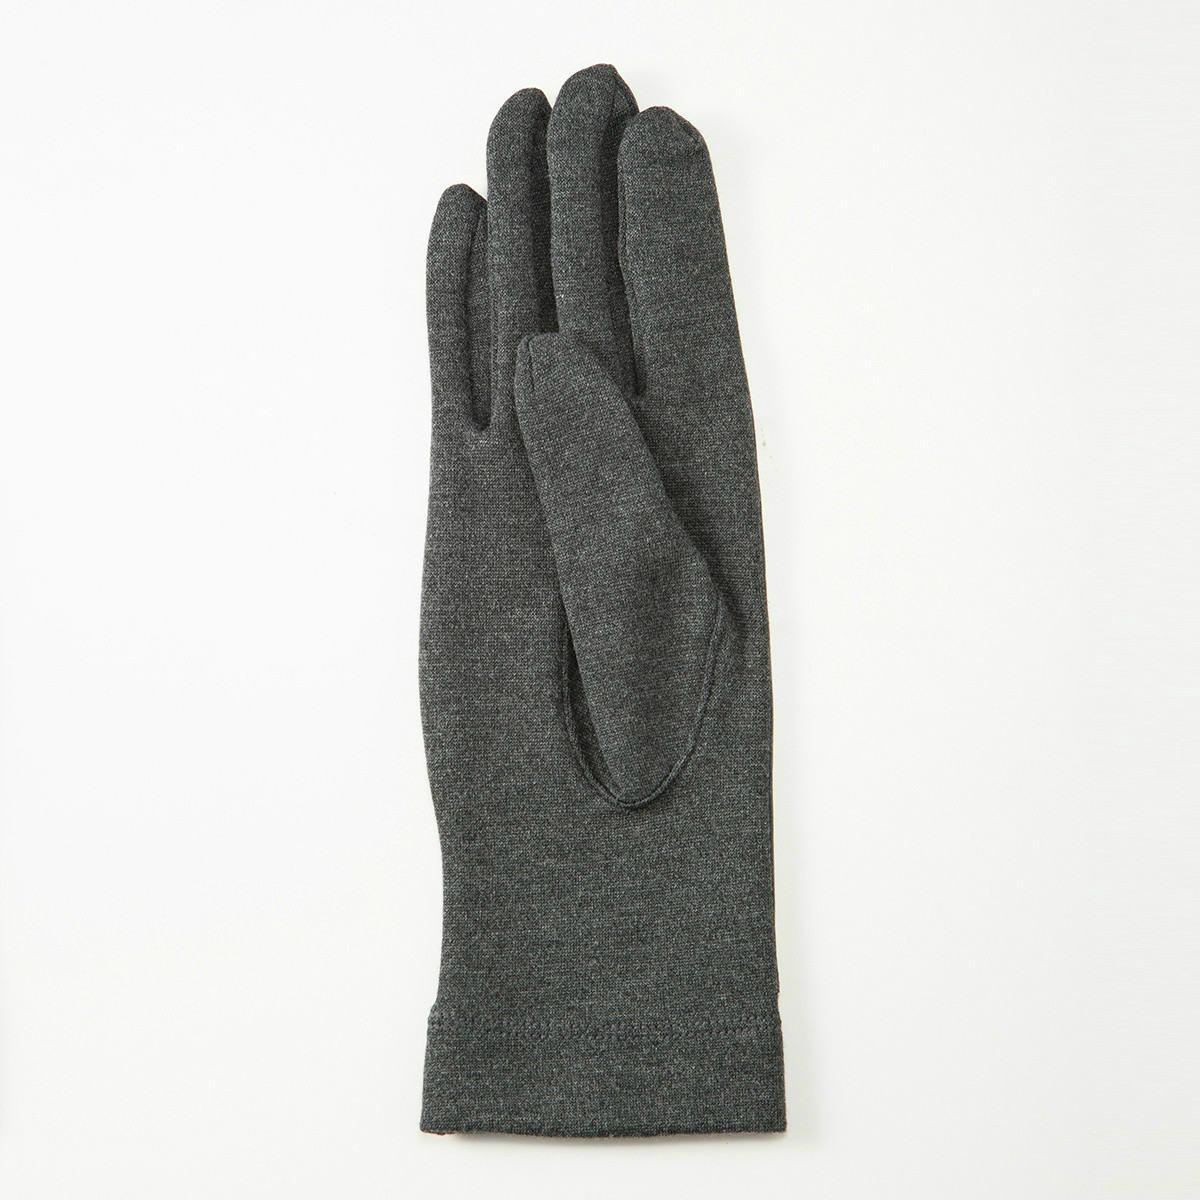 BIYUTE レディース ジャージ手袋 甲側レザー ストレッチ素材との組み合わせ Mサイズ 全3色